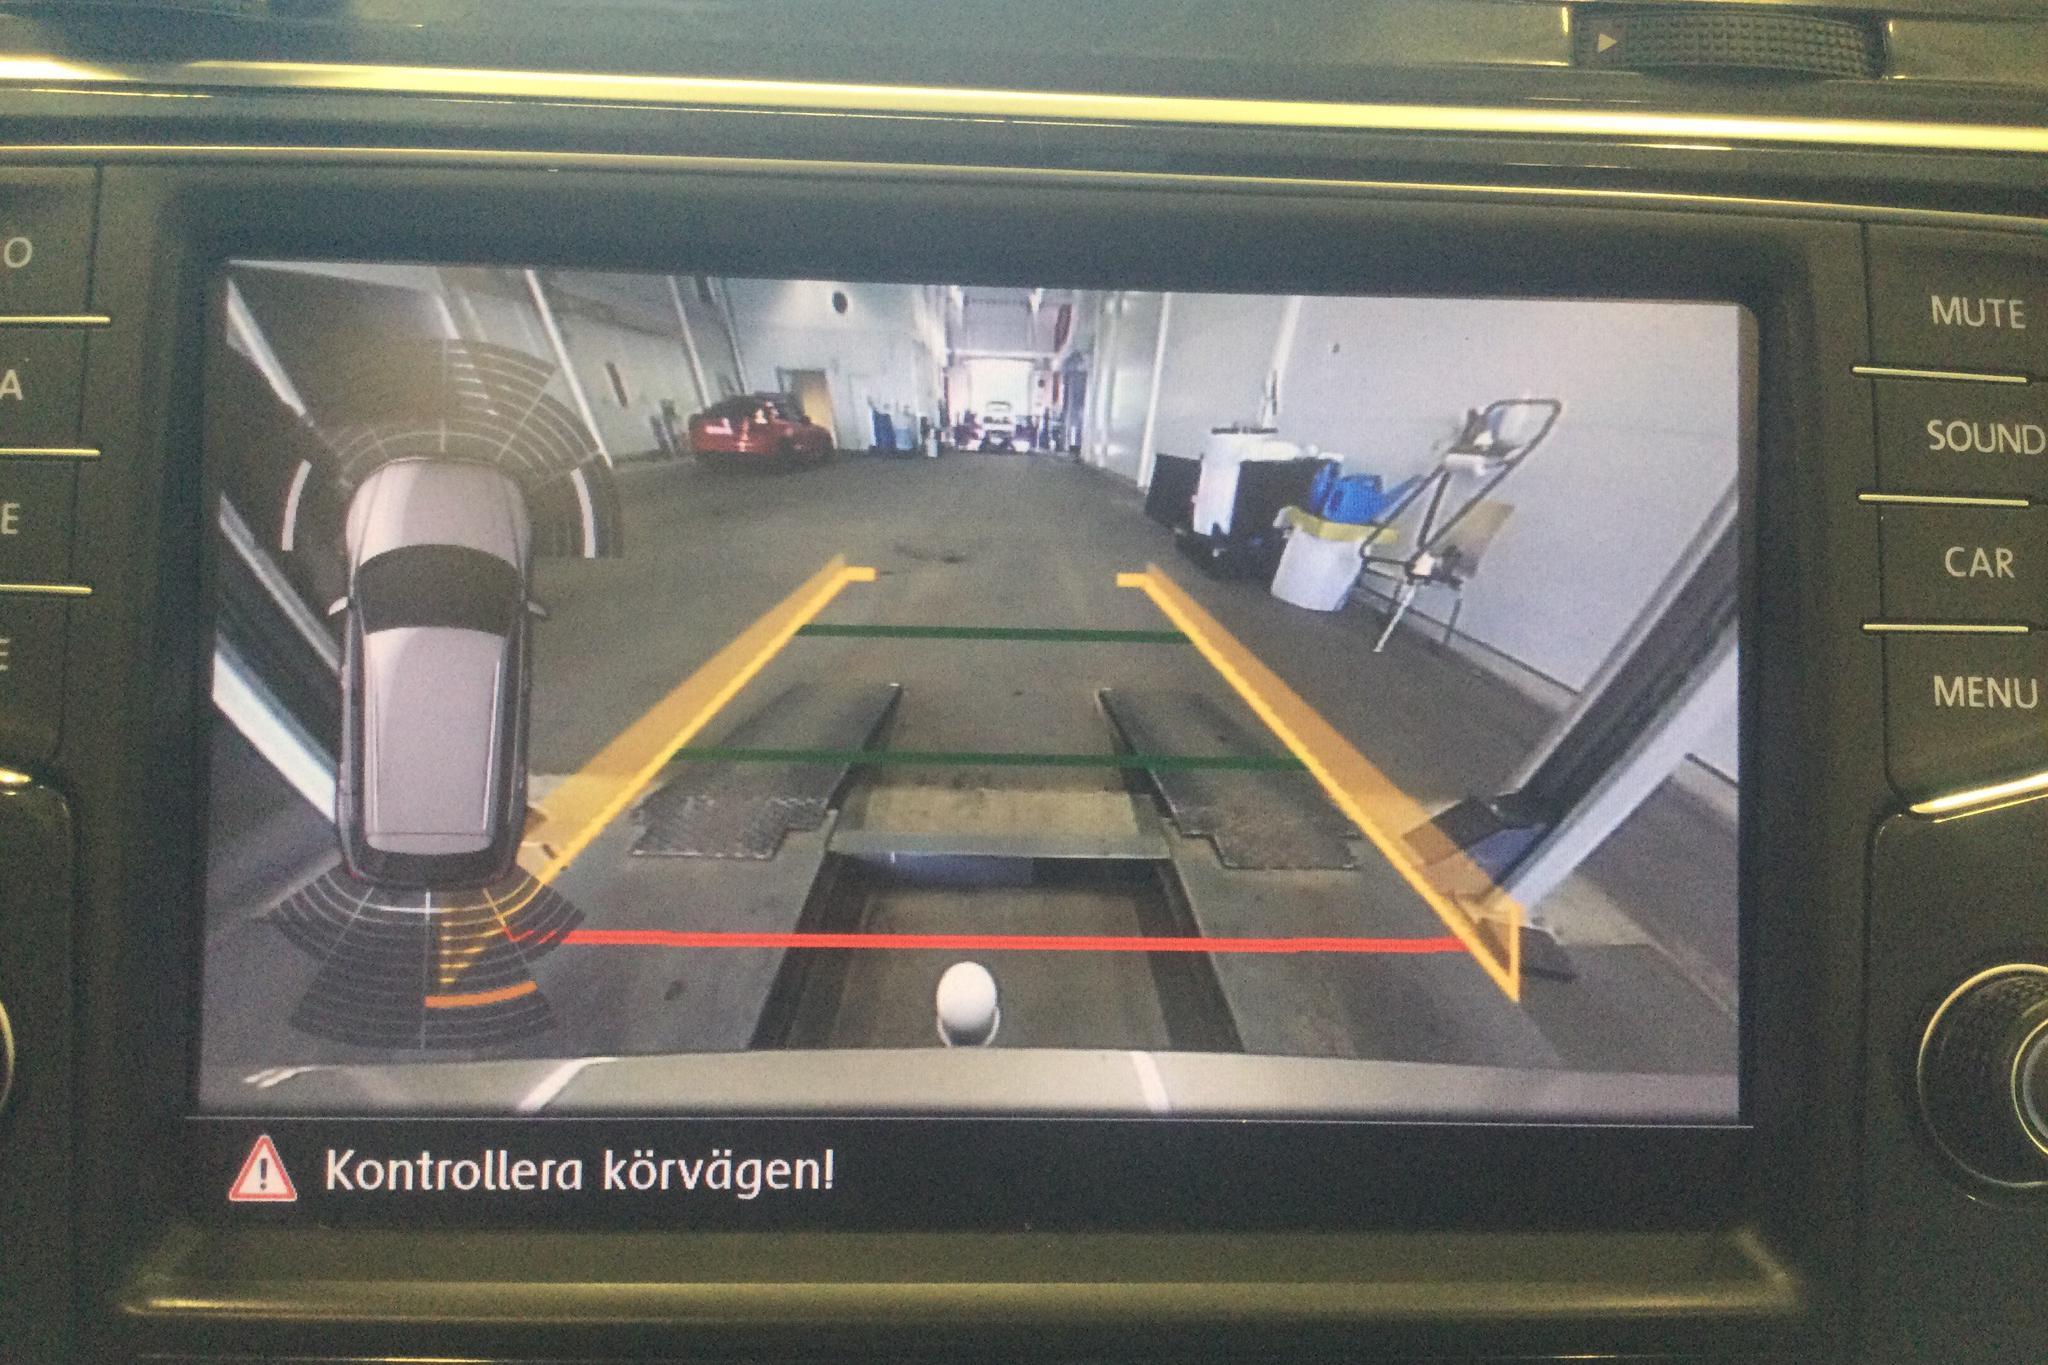 VW Tiguan 2.0 TDI 4MOTION (190hk) - 14 482 mil - Automat - Light Brown - 2017